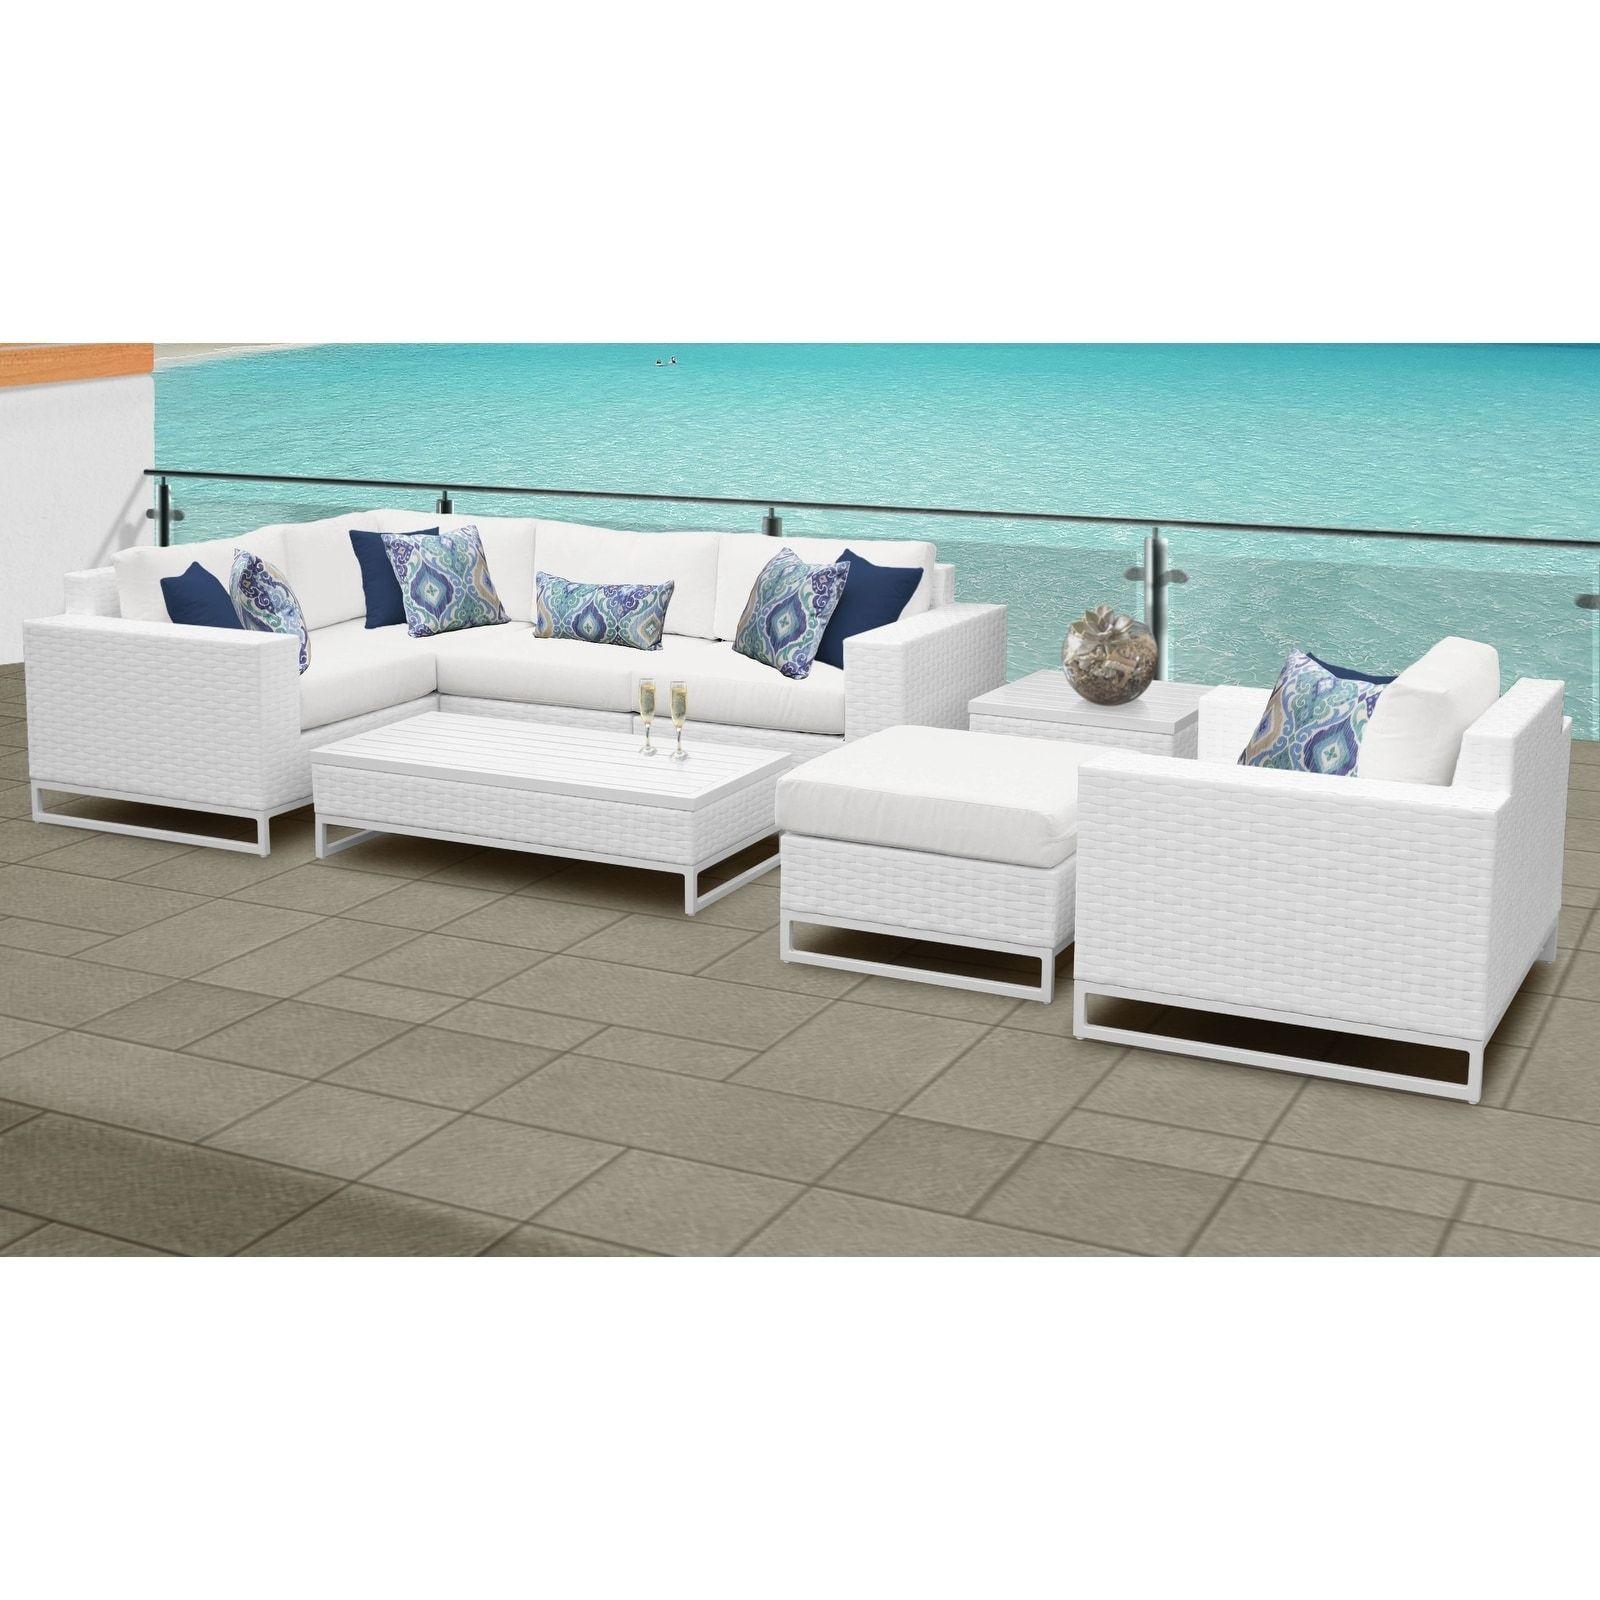 Miami 8 Piece Outdoor Wicker Patio Furniture Set 08g White Tk